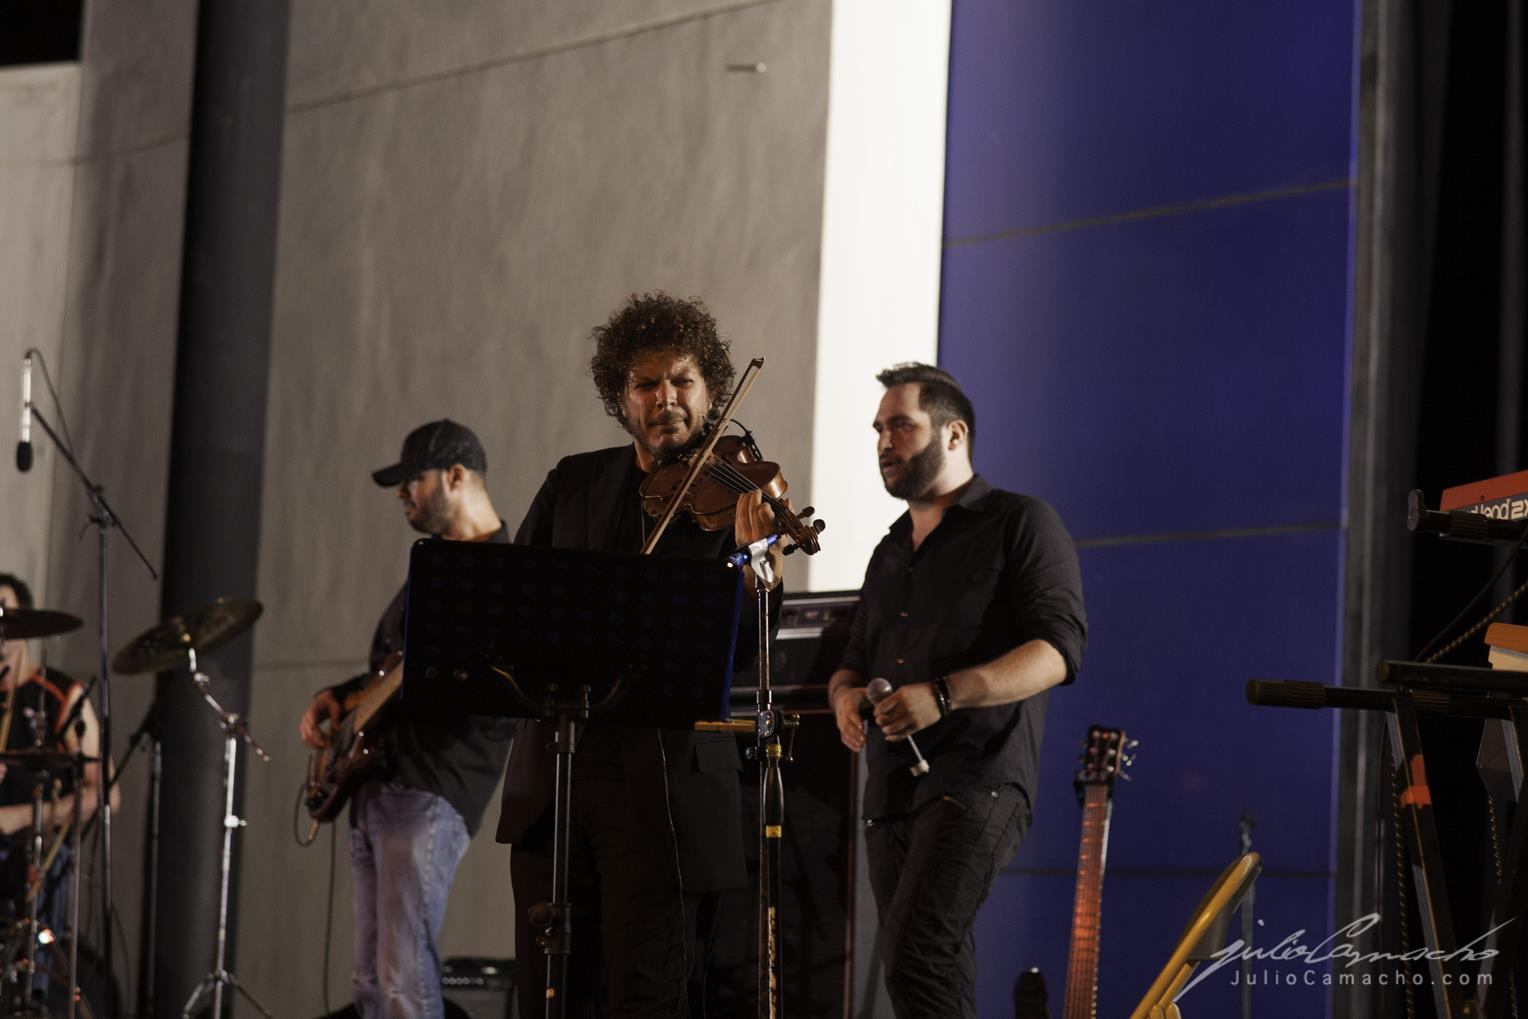 2014-10-30 31 CAST TOUR Ensenada y Tijuana - 0979 - www.Juli (Copy).jpg